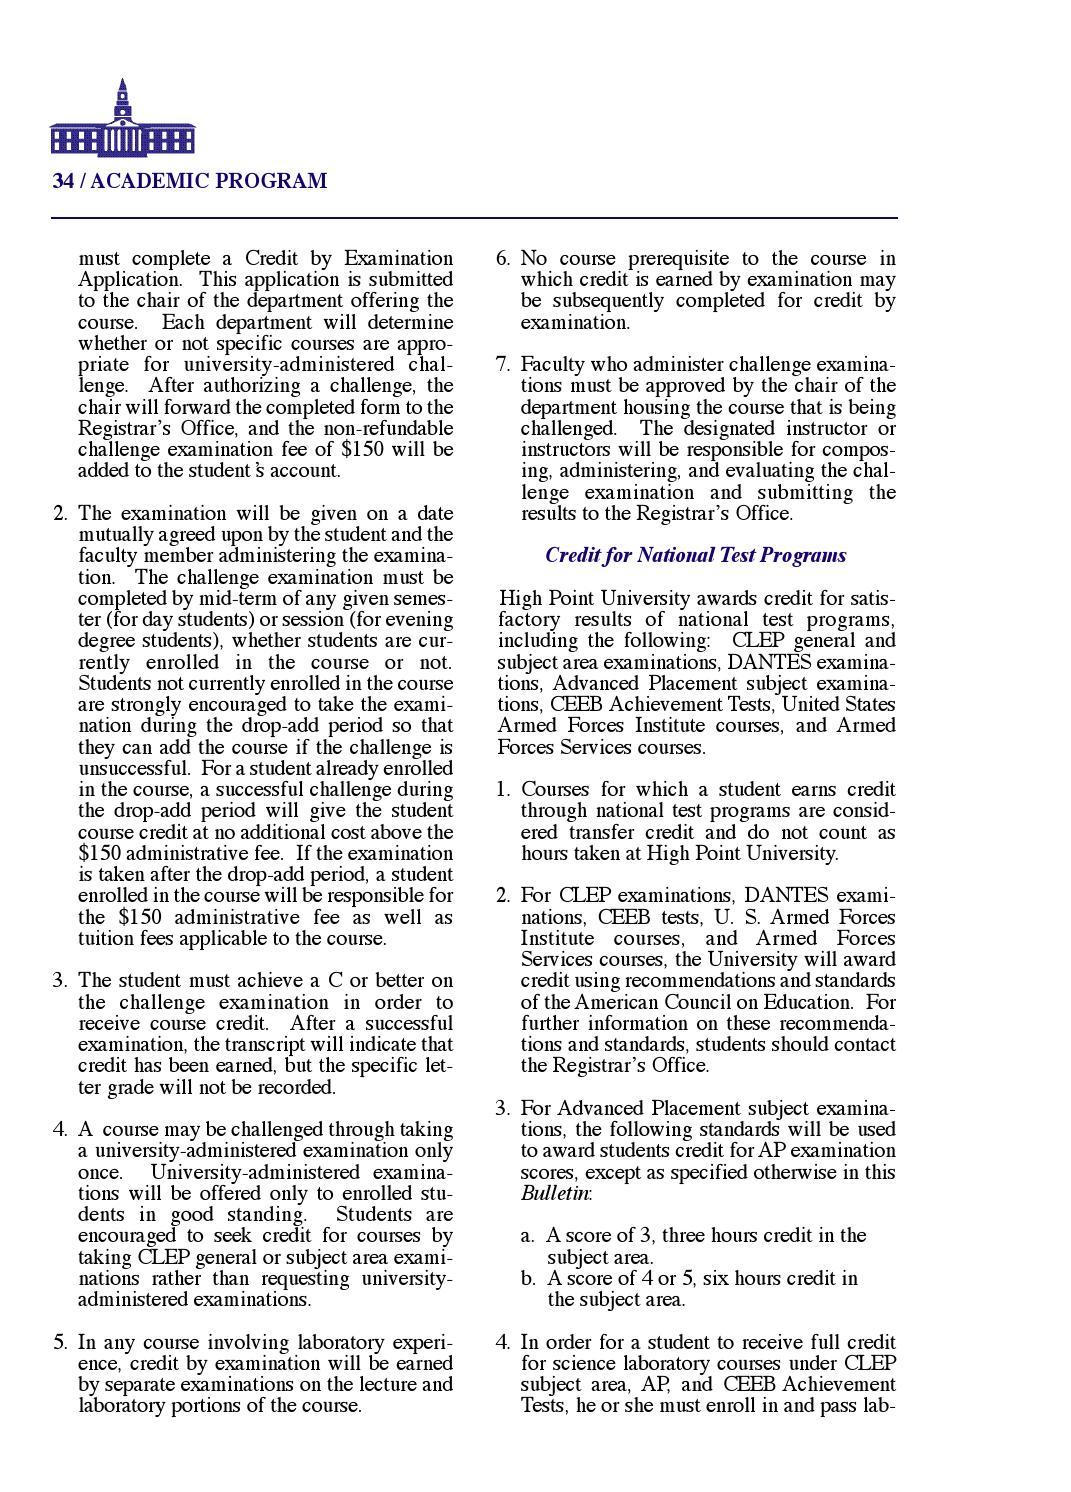 High Point University Undergraduate Bulletin 2008-2009 by High Point